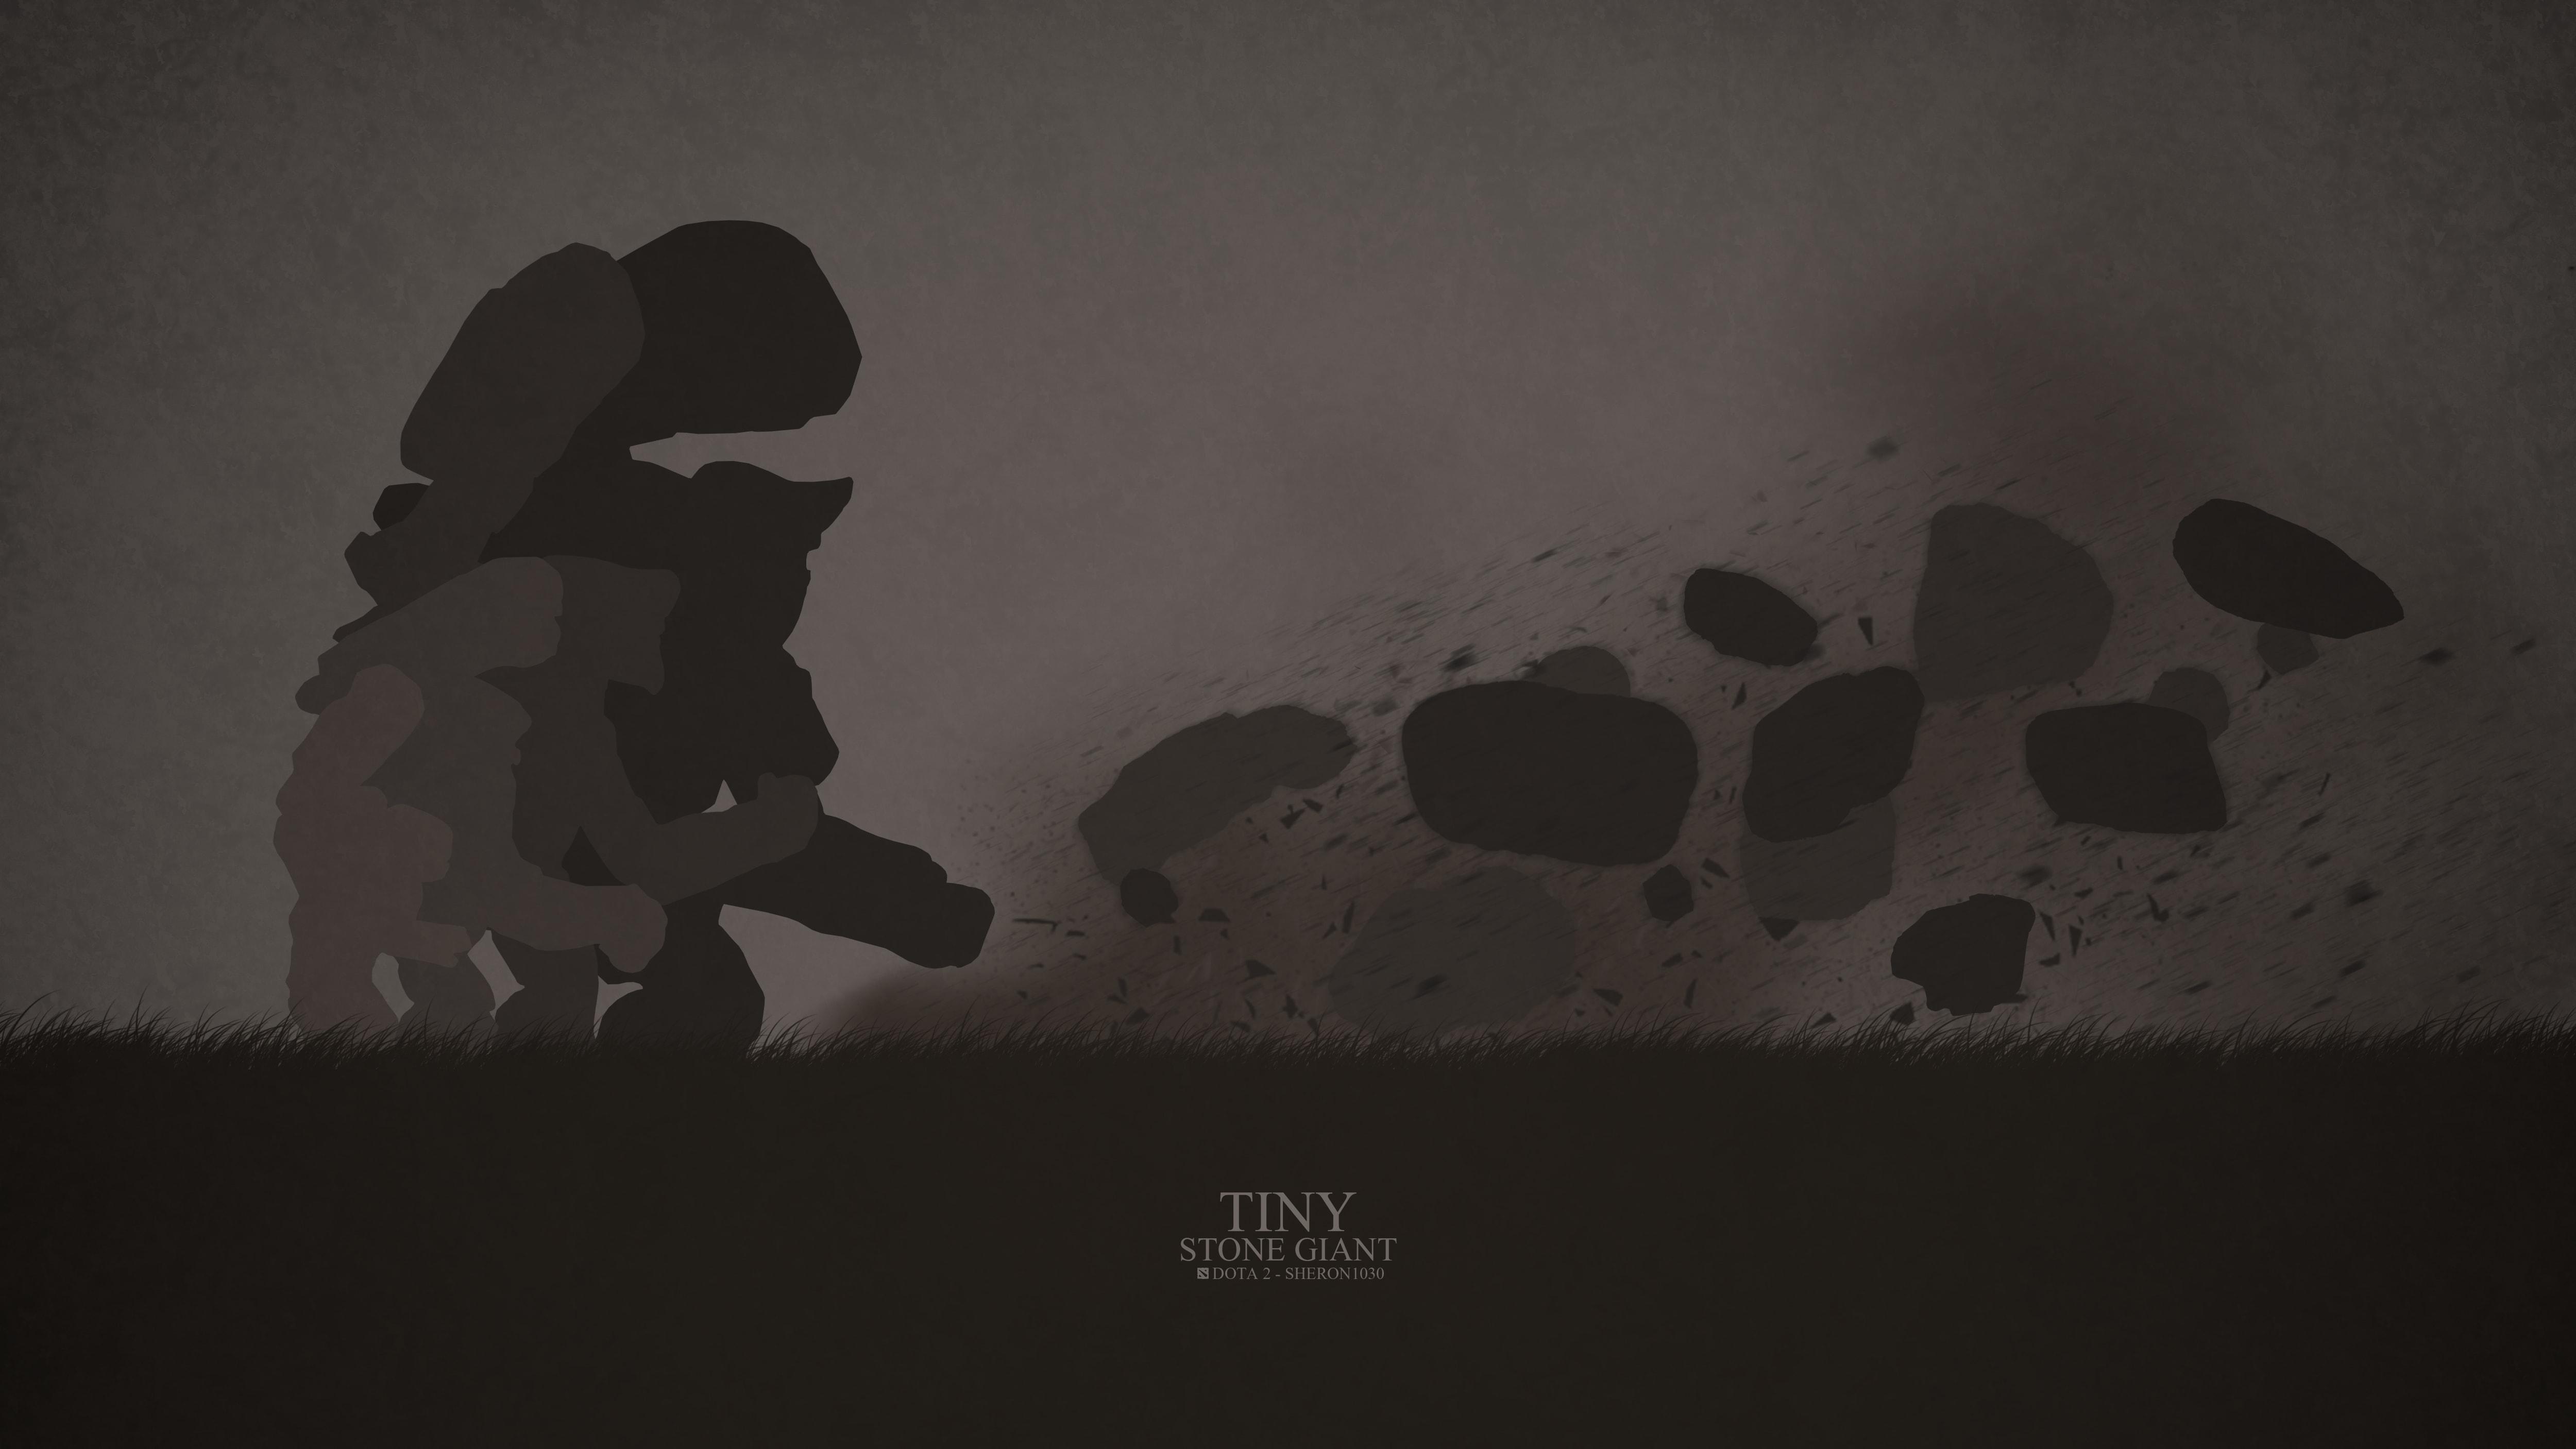 Dota2 : Tiny Wallpaper